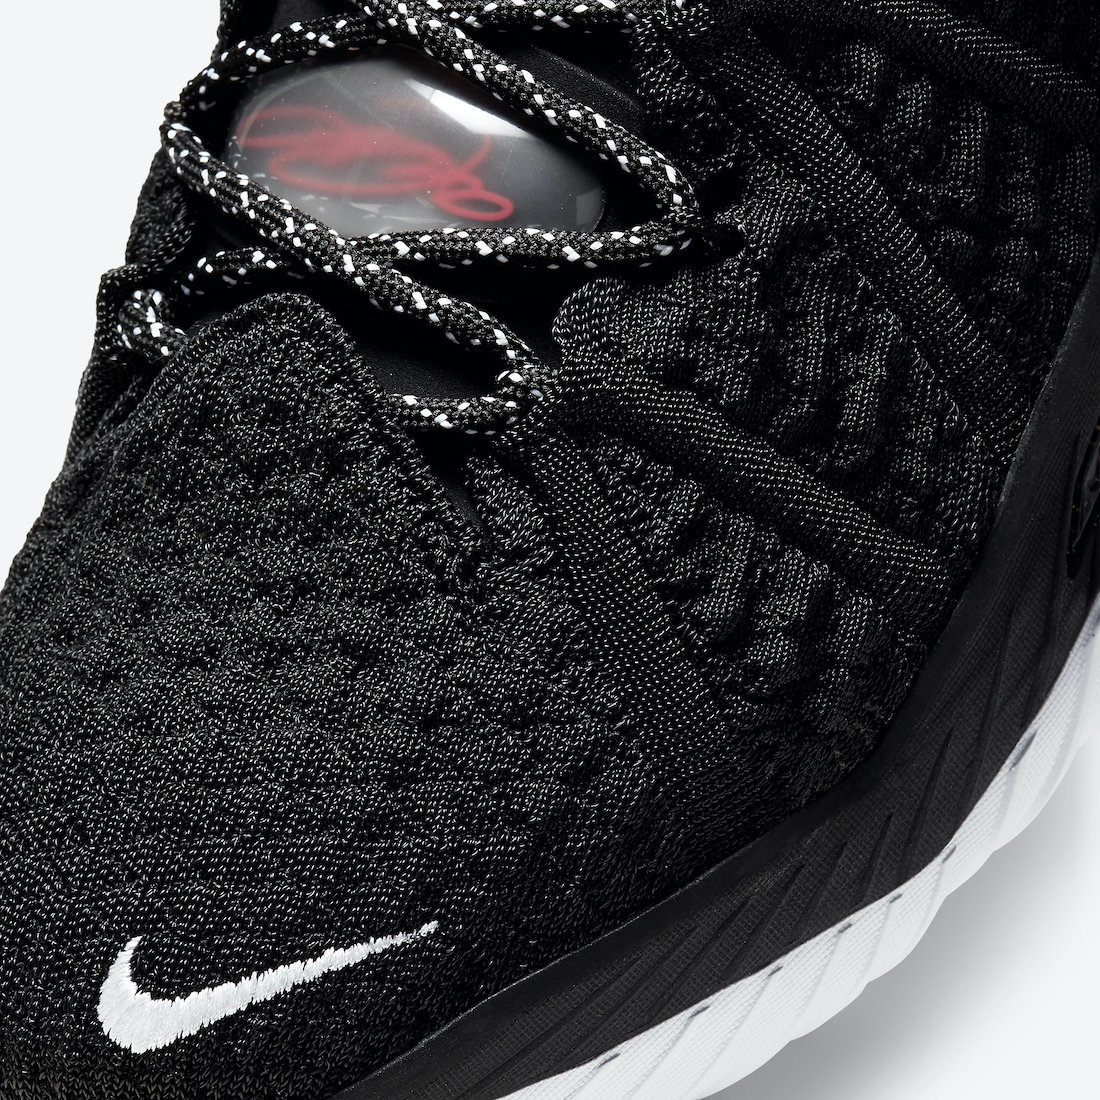 Nike LeBron 18 Black University Red White CQ9283-001 Release Date Info